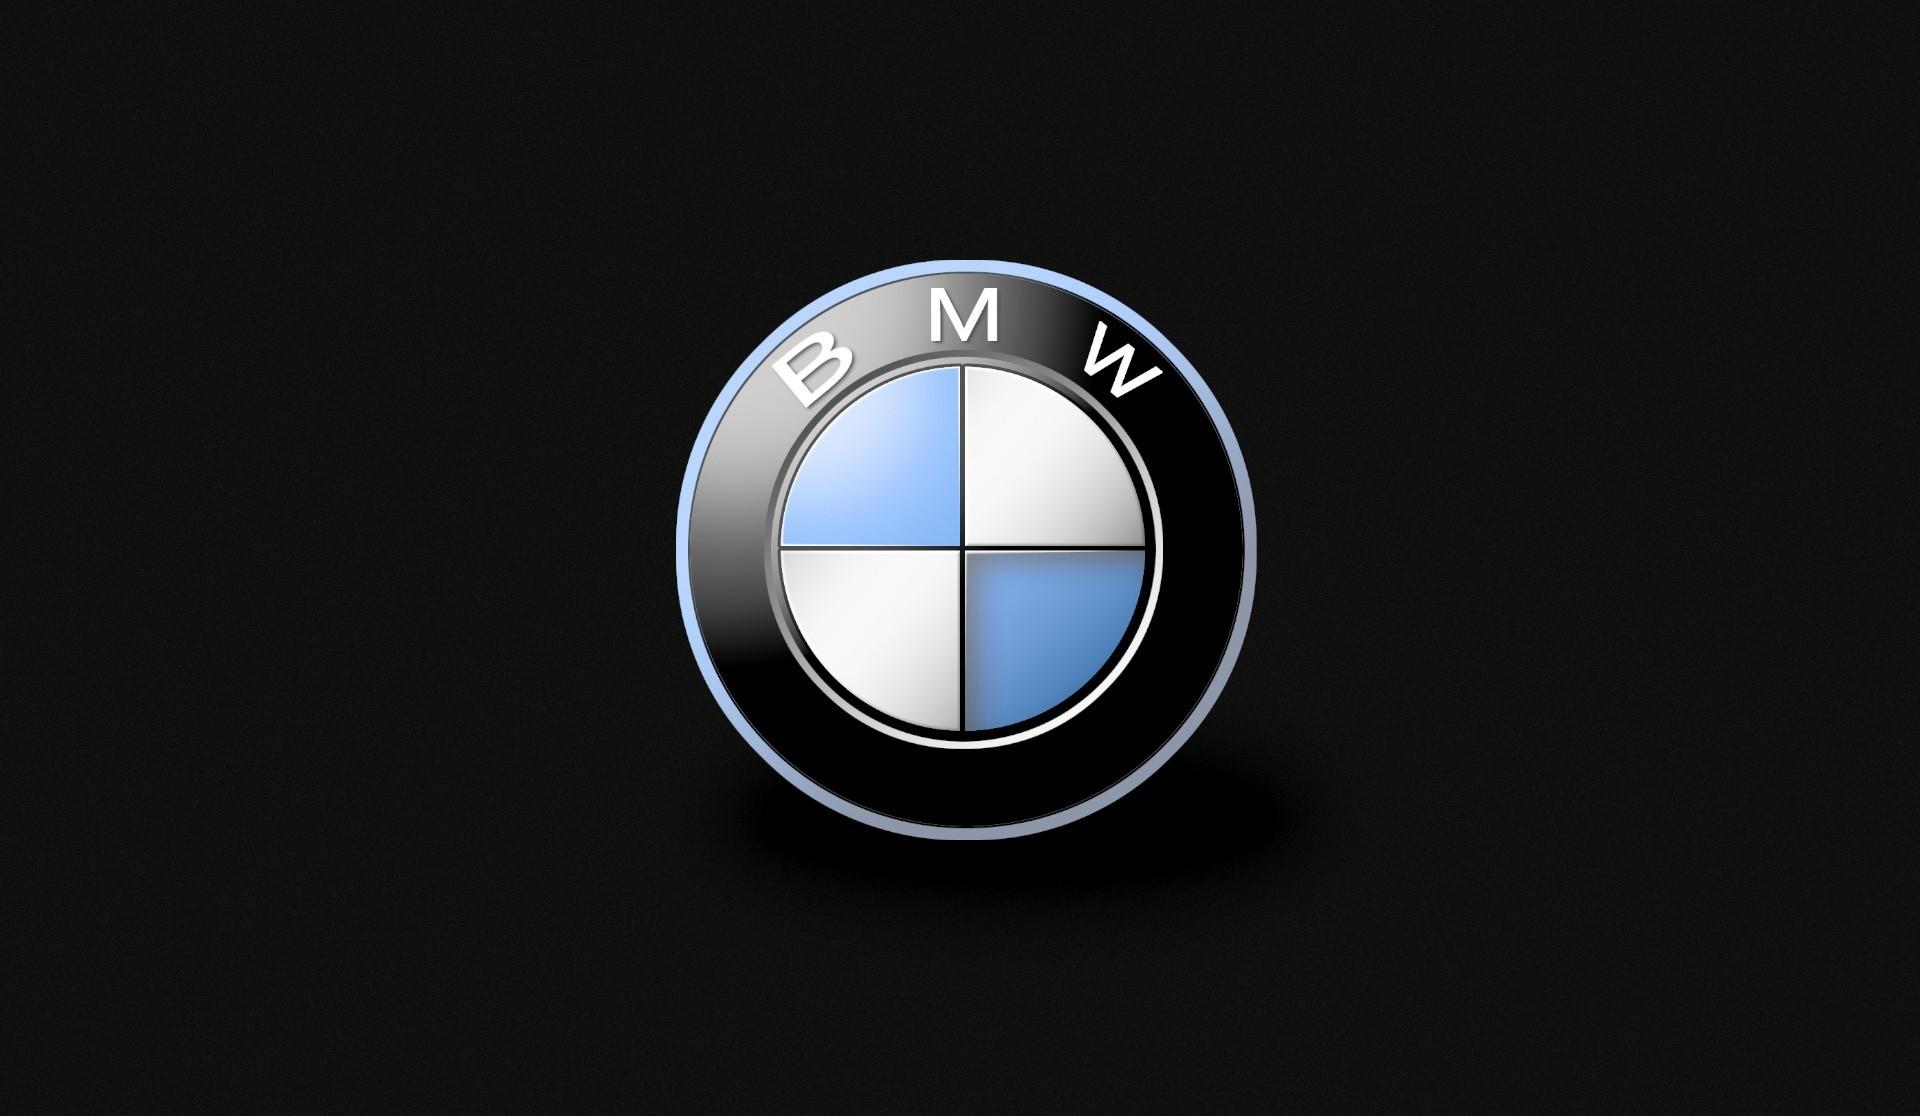 BMW Brand Cars Full HD Black Desktop Logo Wallpapers